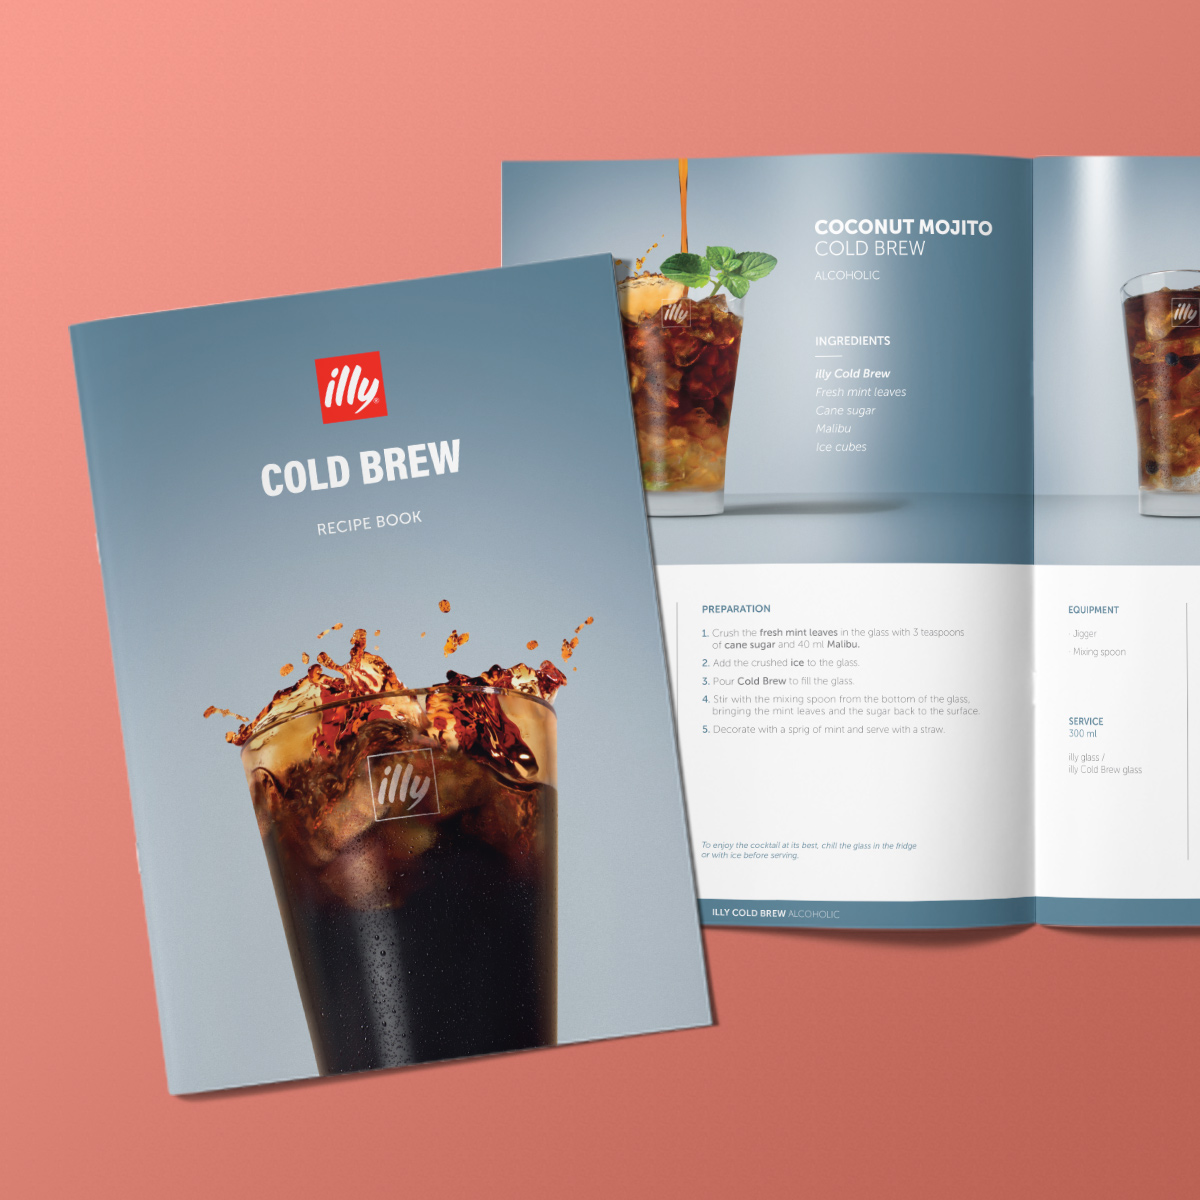 ILLY_coldbrew_recipebook